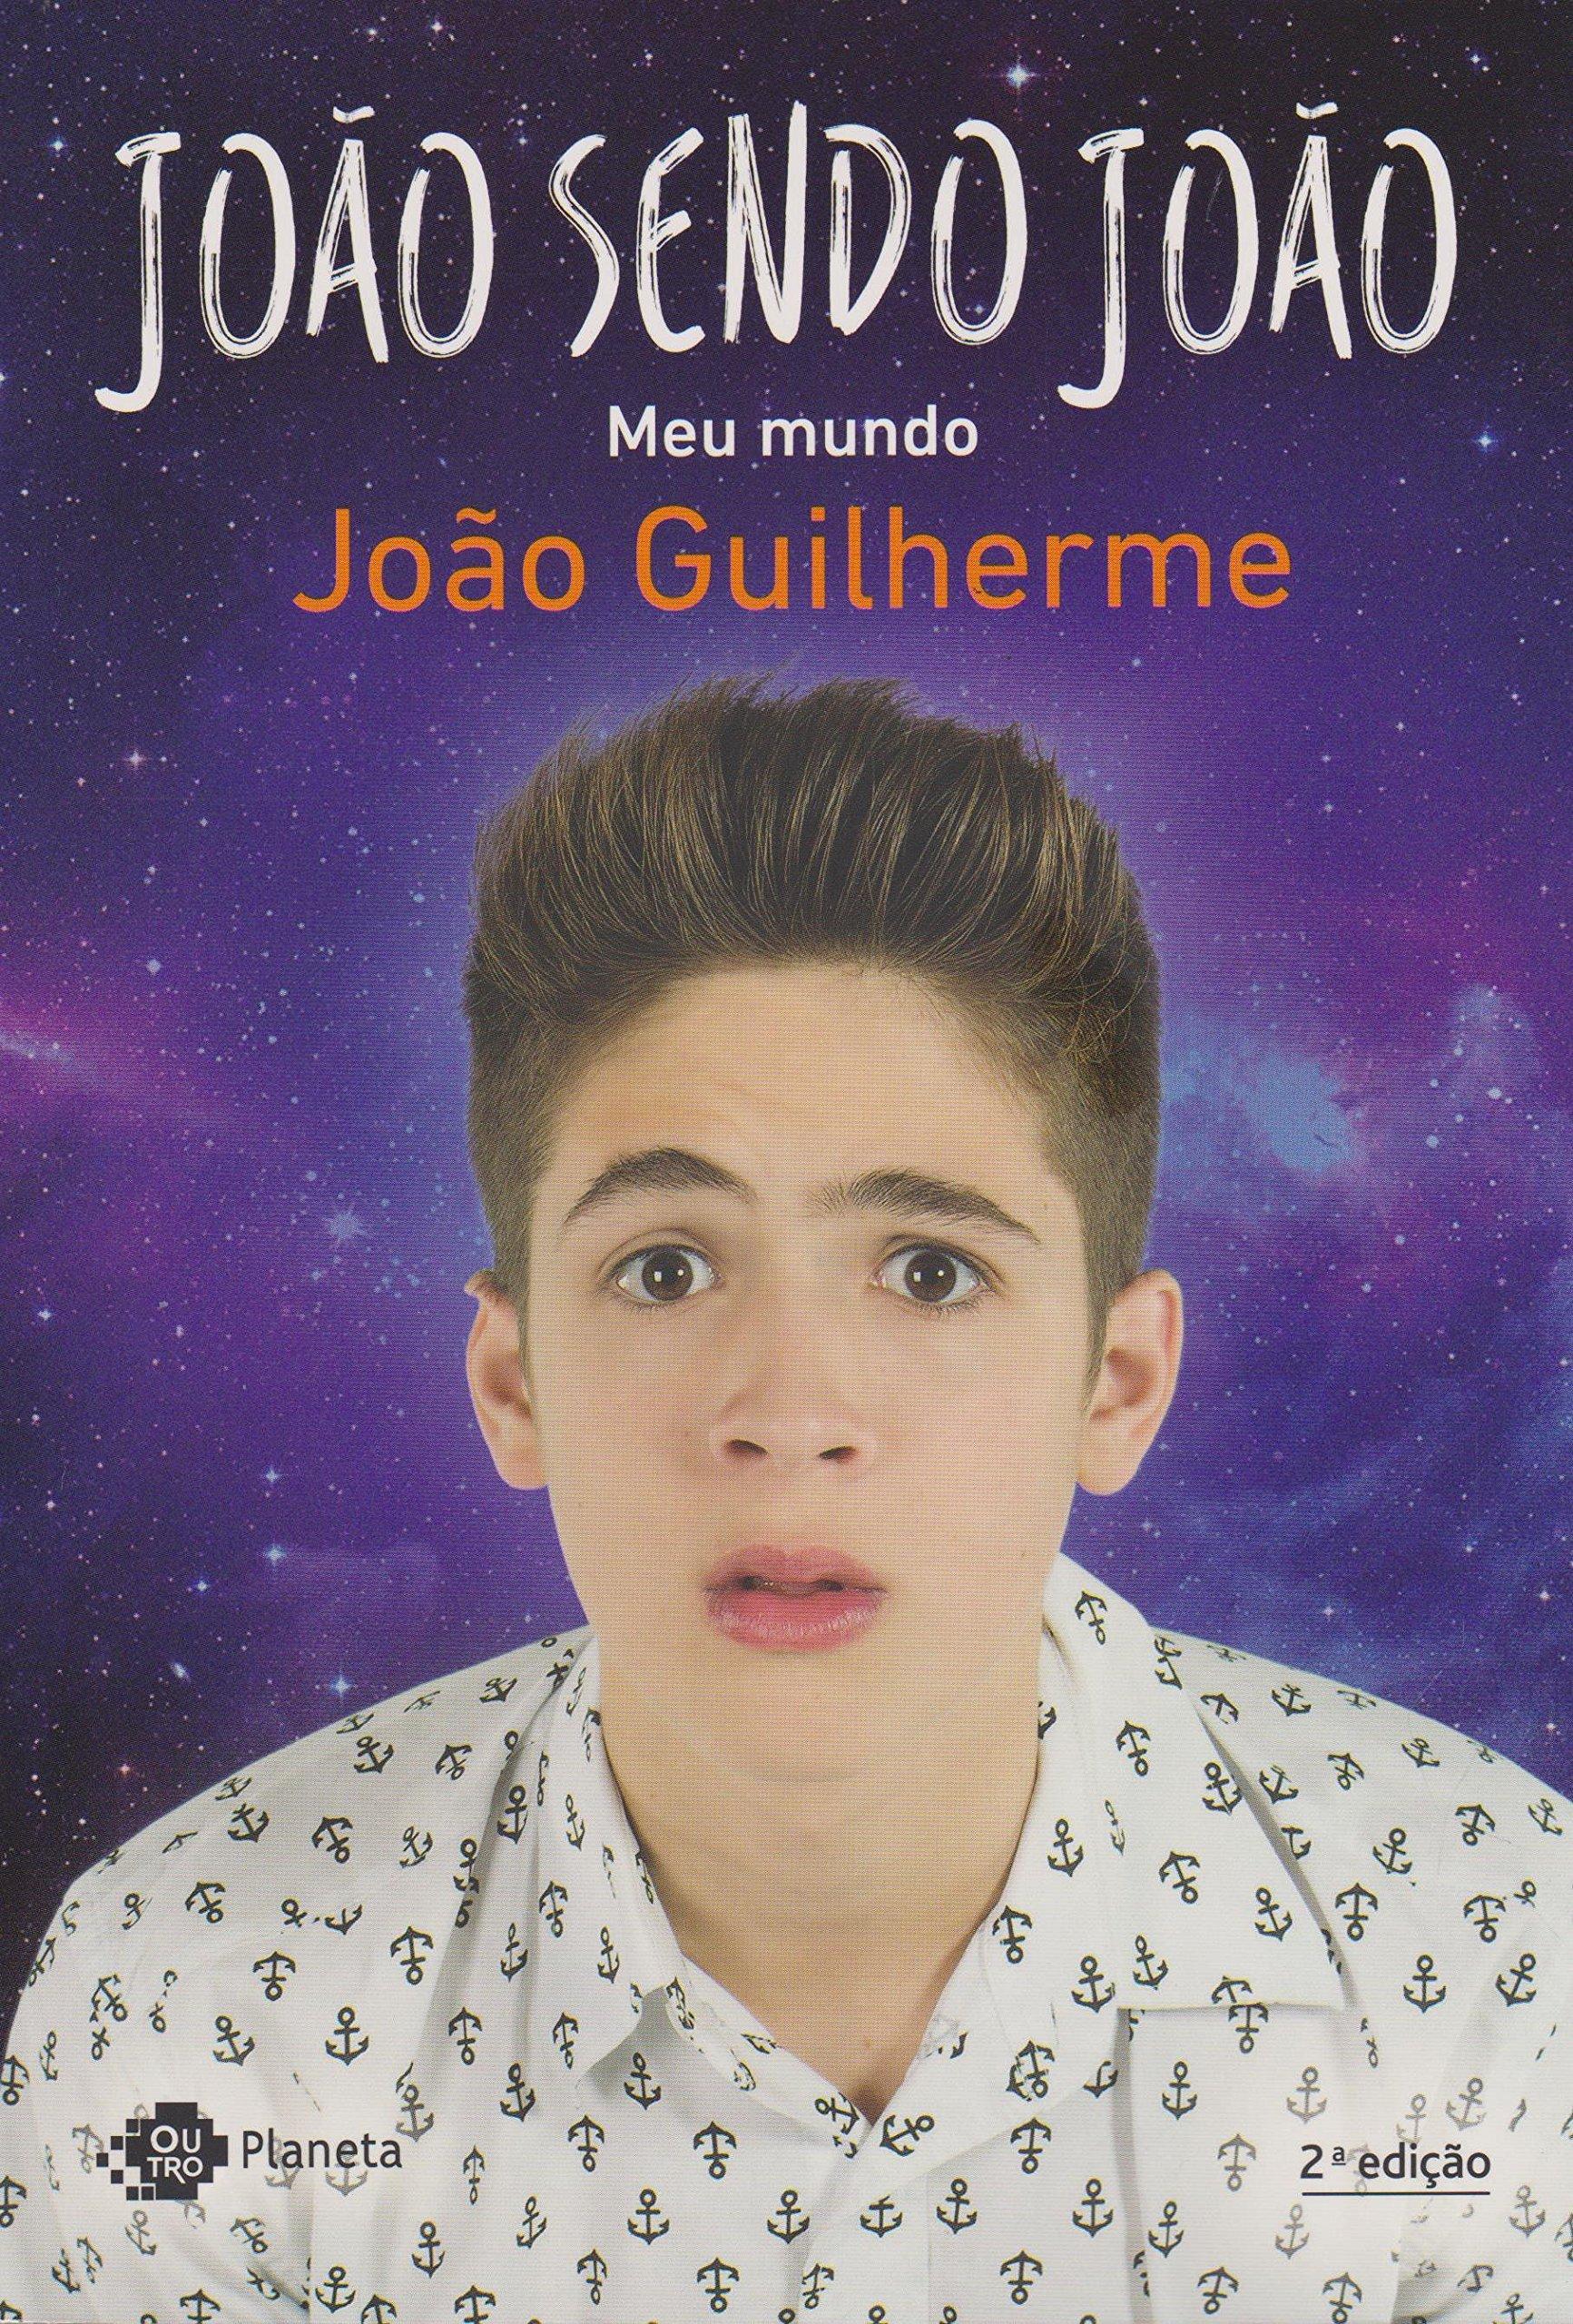 d9335aab6fff5 João sendo João - 9788542207965 - Livros na Amazon Brasil